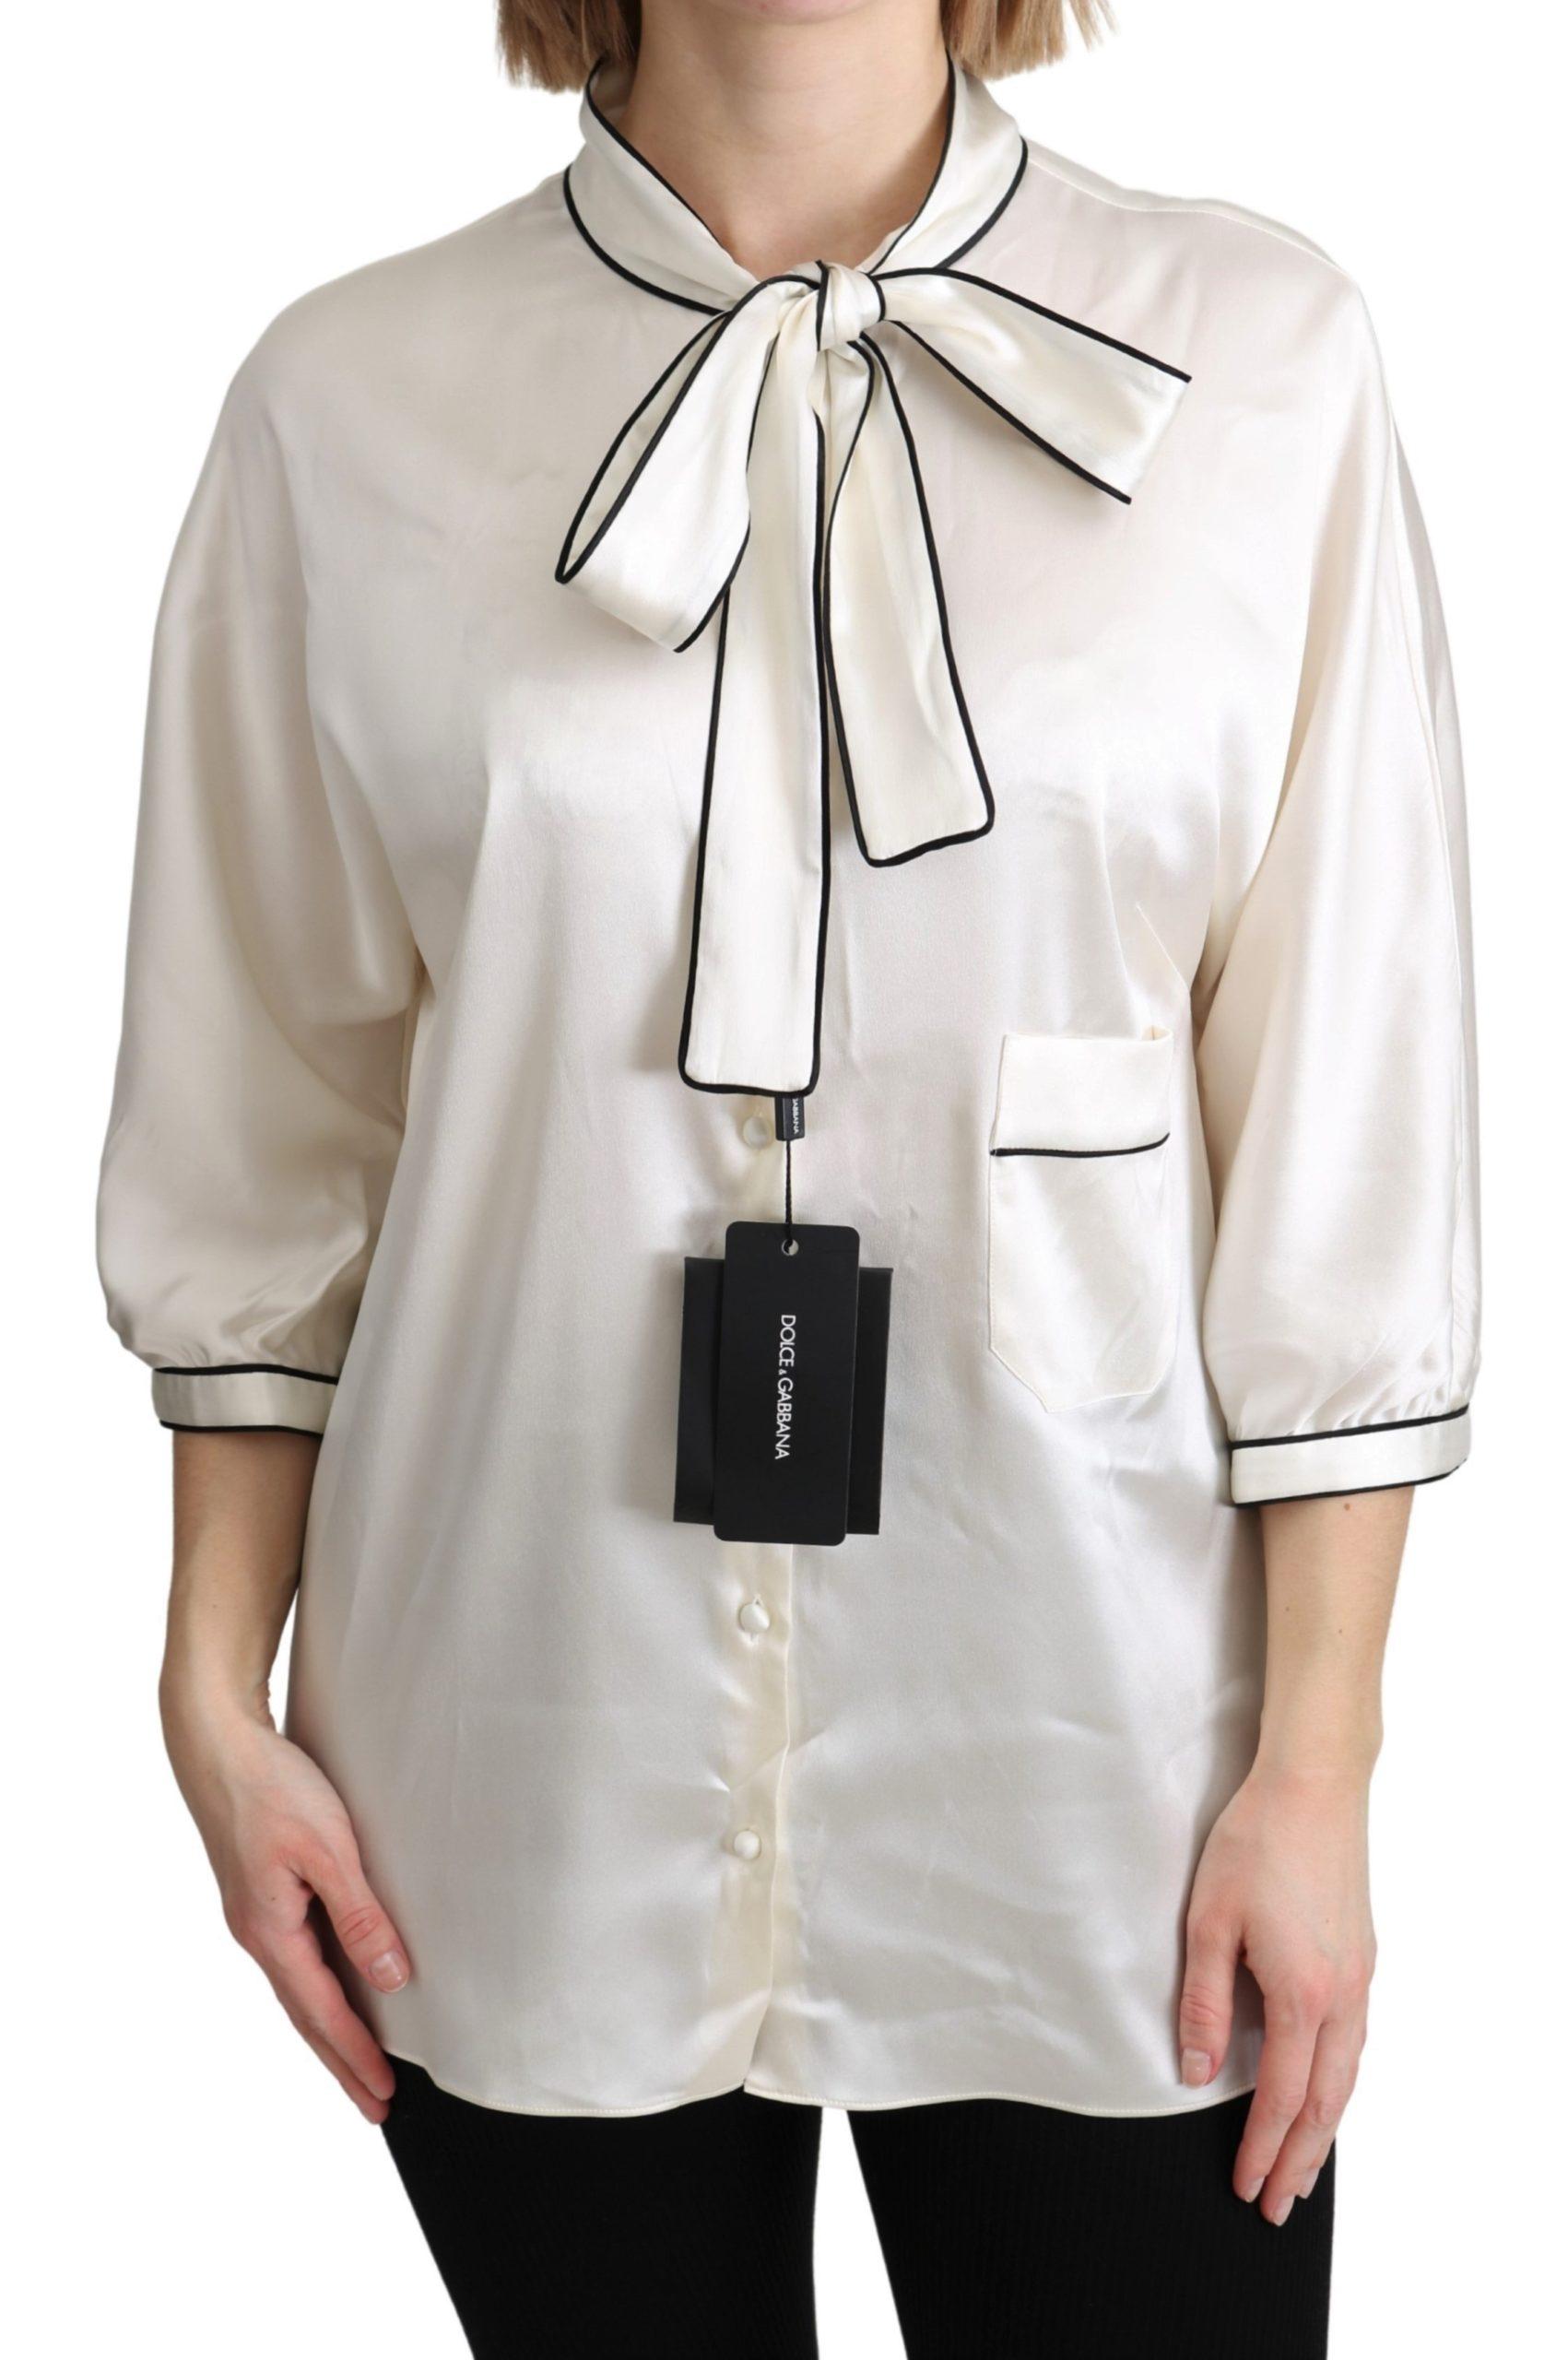 Dolce & Gabbana Women's Silk Off Top White TSH4818 - IT46 XL